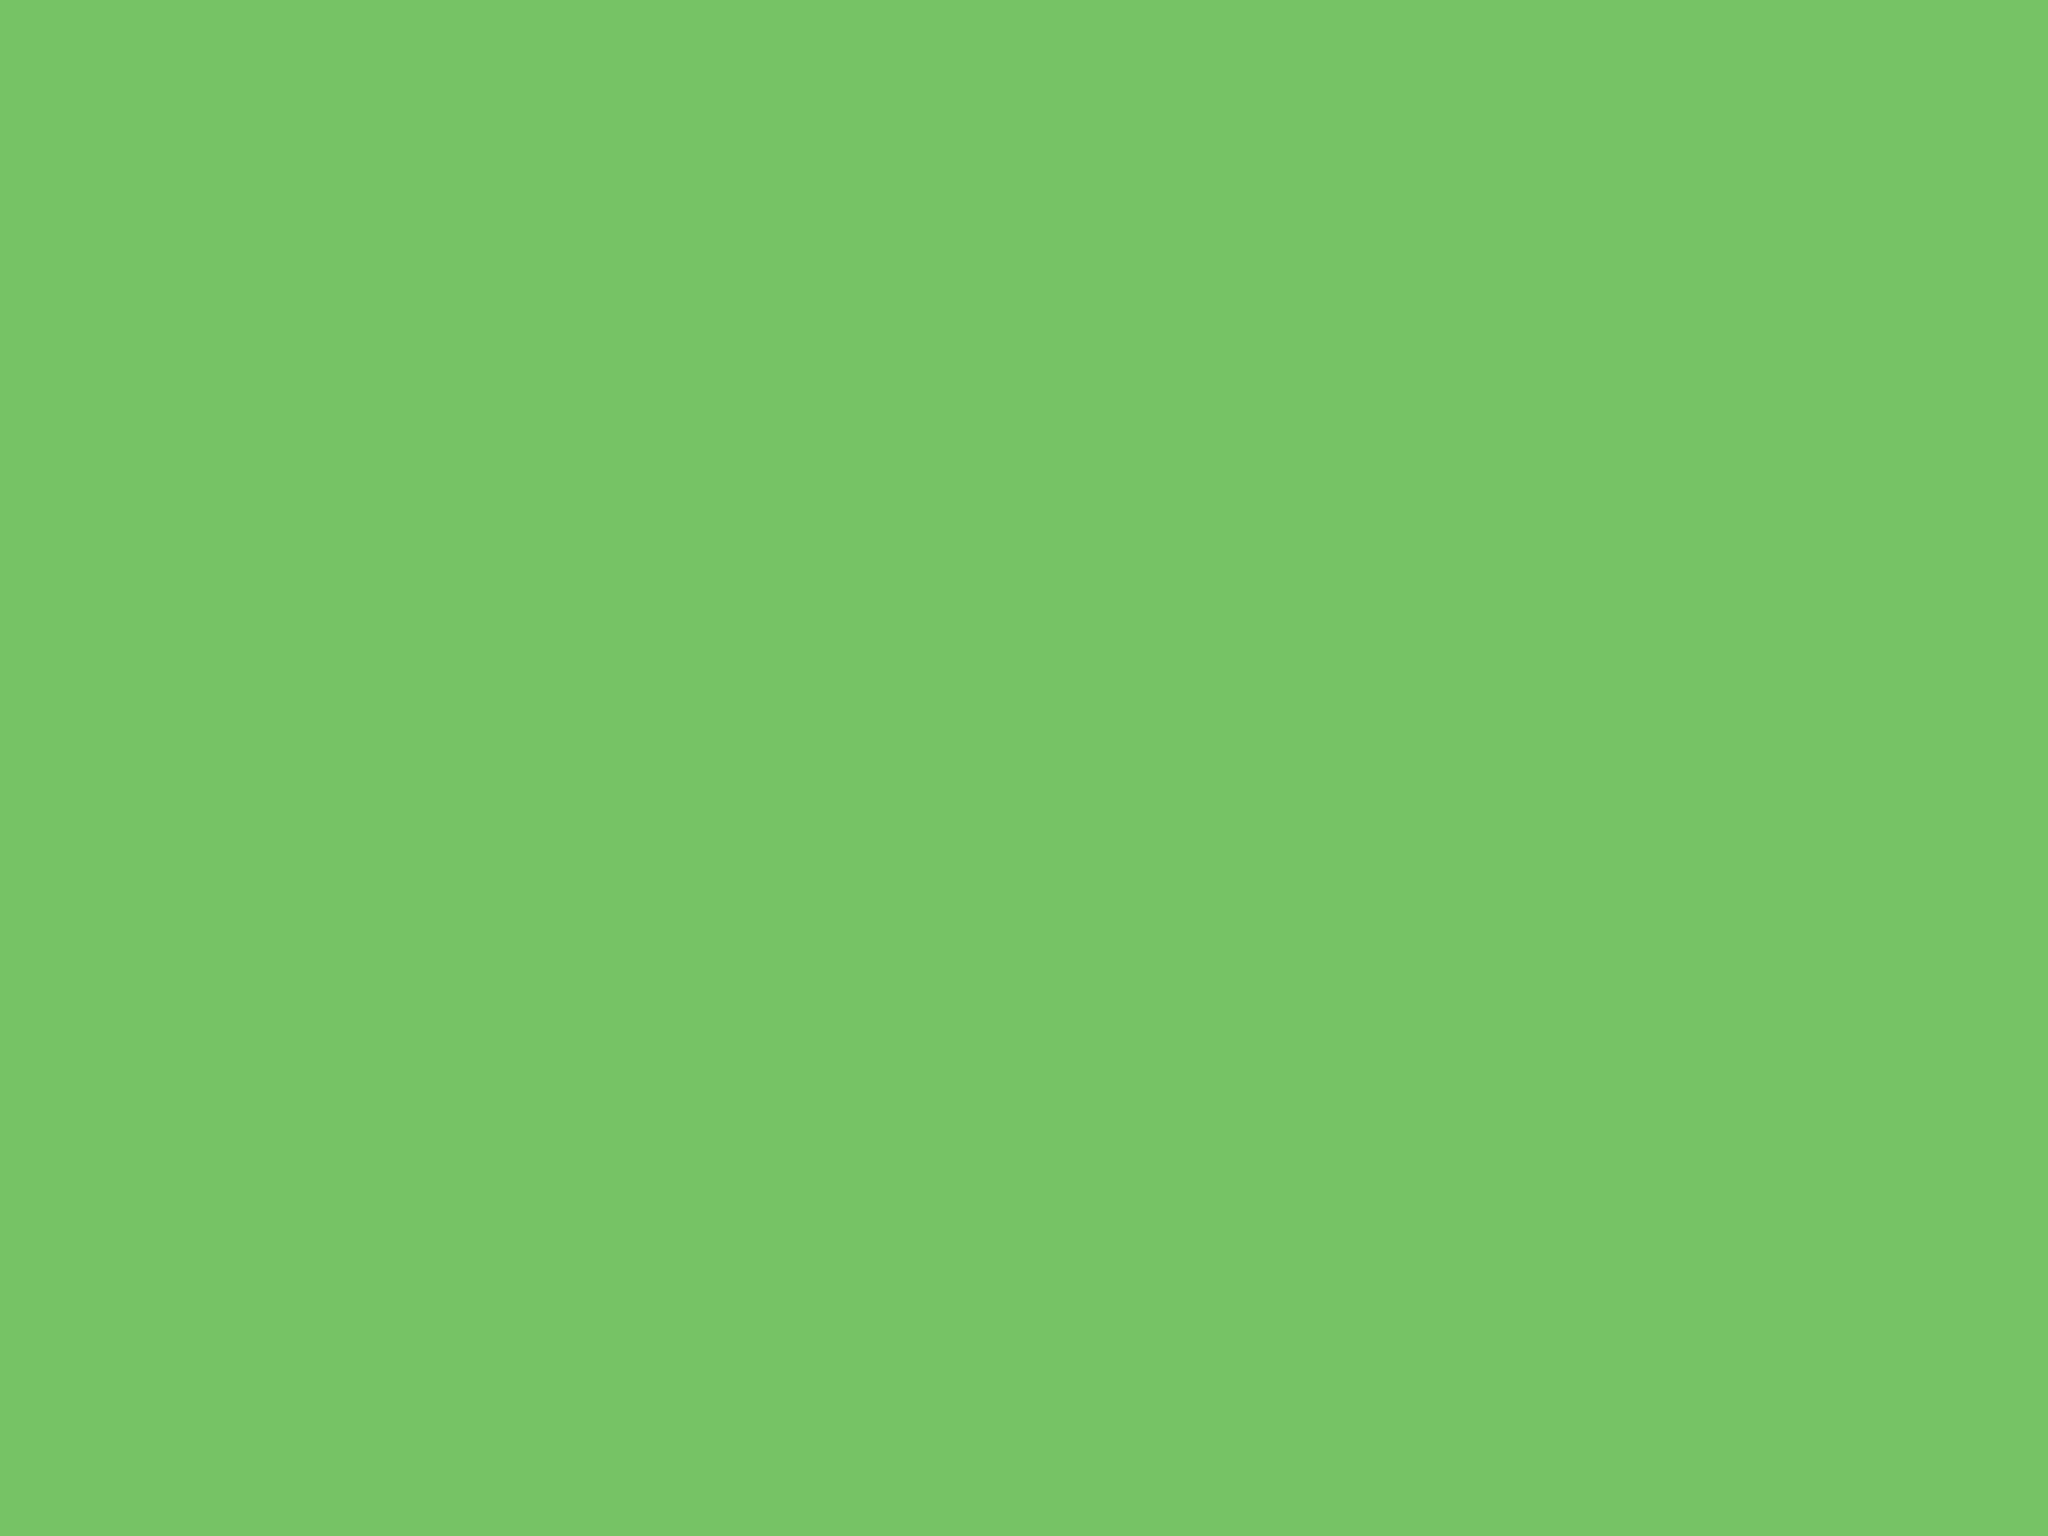 2048x1536 Mantis Solid Color Background